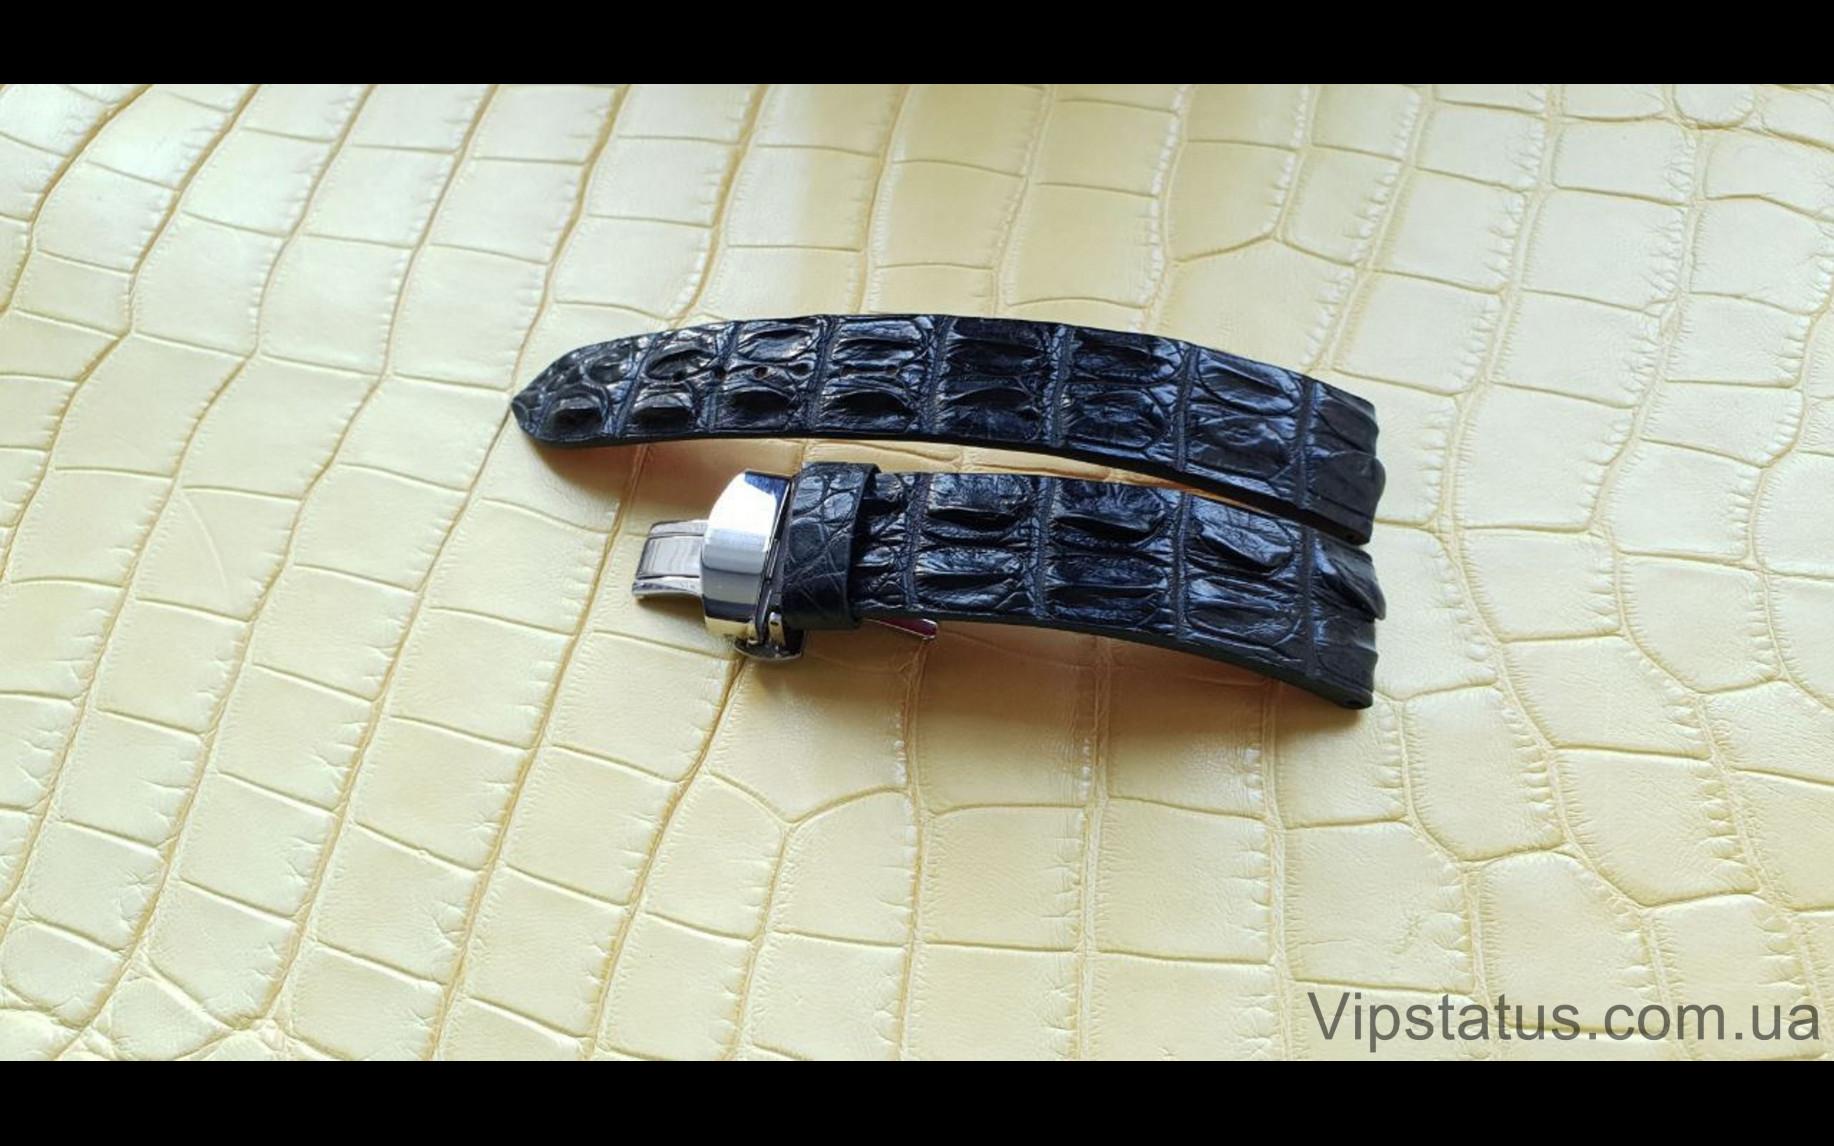 Elite Премиум ремешок для часов Blancpain кожа крокодила Premium Crocodile Strap for Blancpain watches image 3